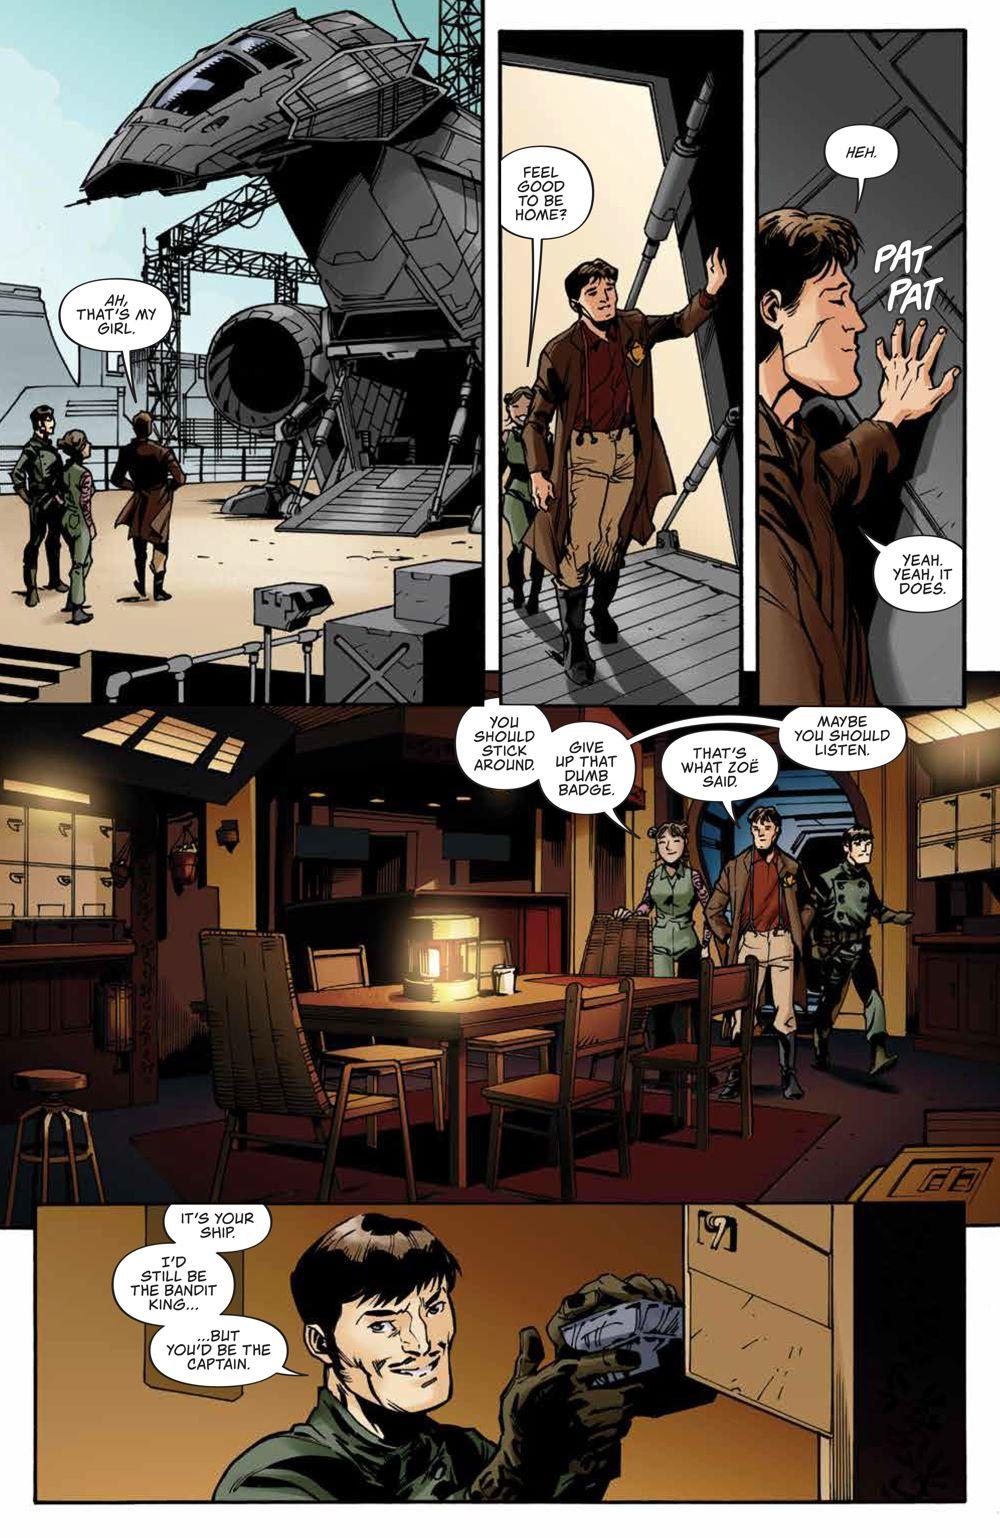 Firefly_NewSheriffVerse_v2_HC_PRESS_22 ComicList Previews: FIREFLY NEW SHERIFF IN THE 'VERSE VOLUME 2 HC